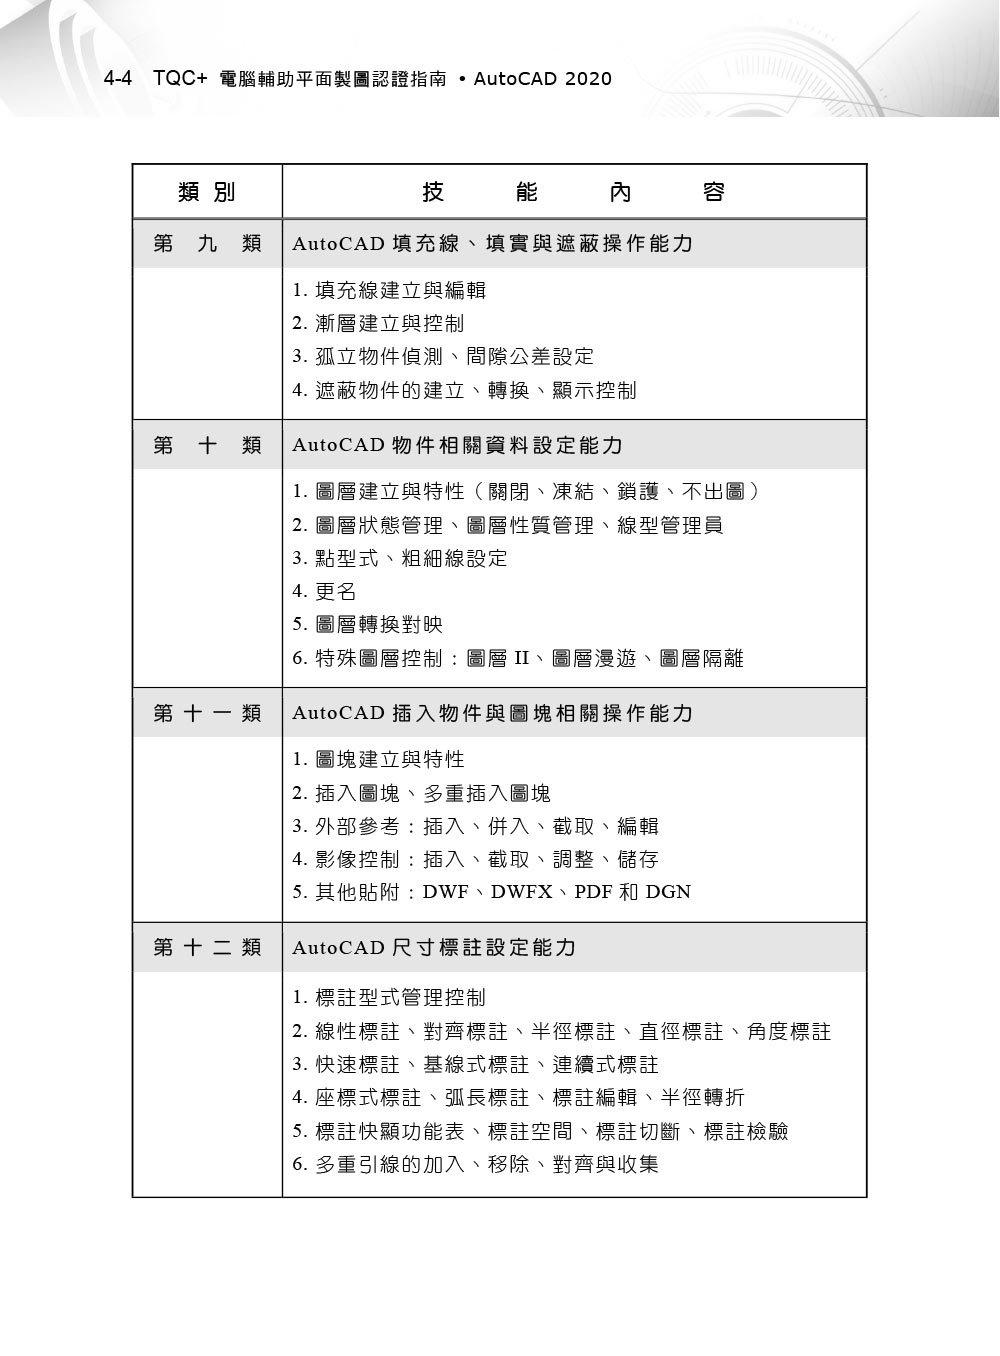 TQC+ 電腦輔助平面製圖認證指南 AutoCAD 2020-preview-4